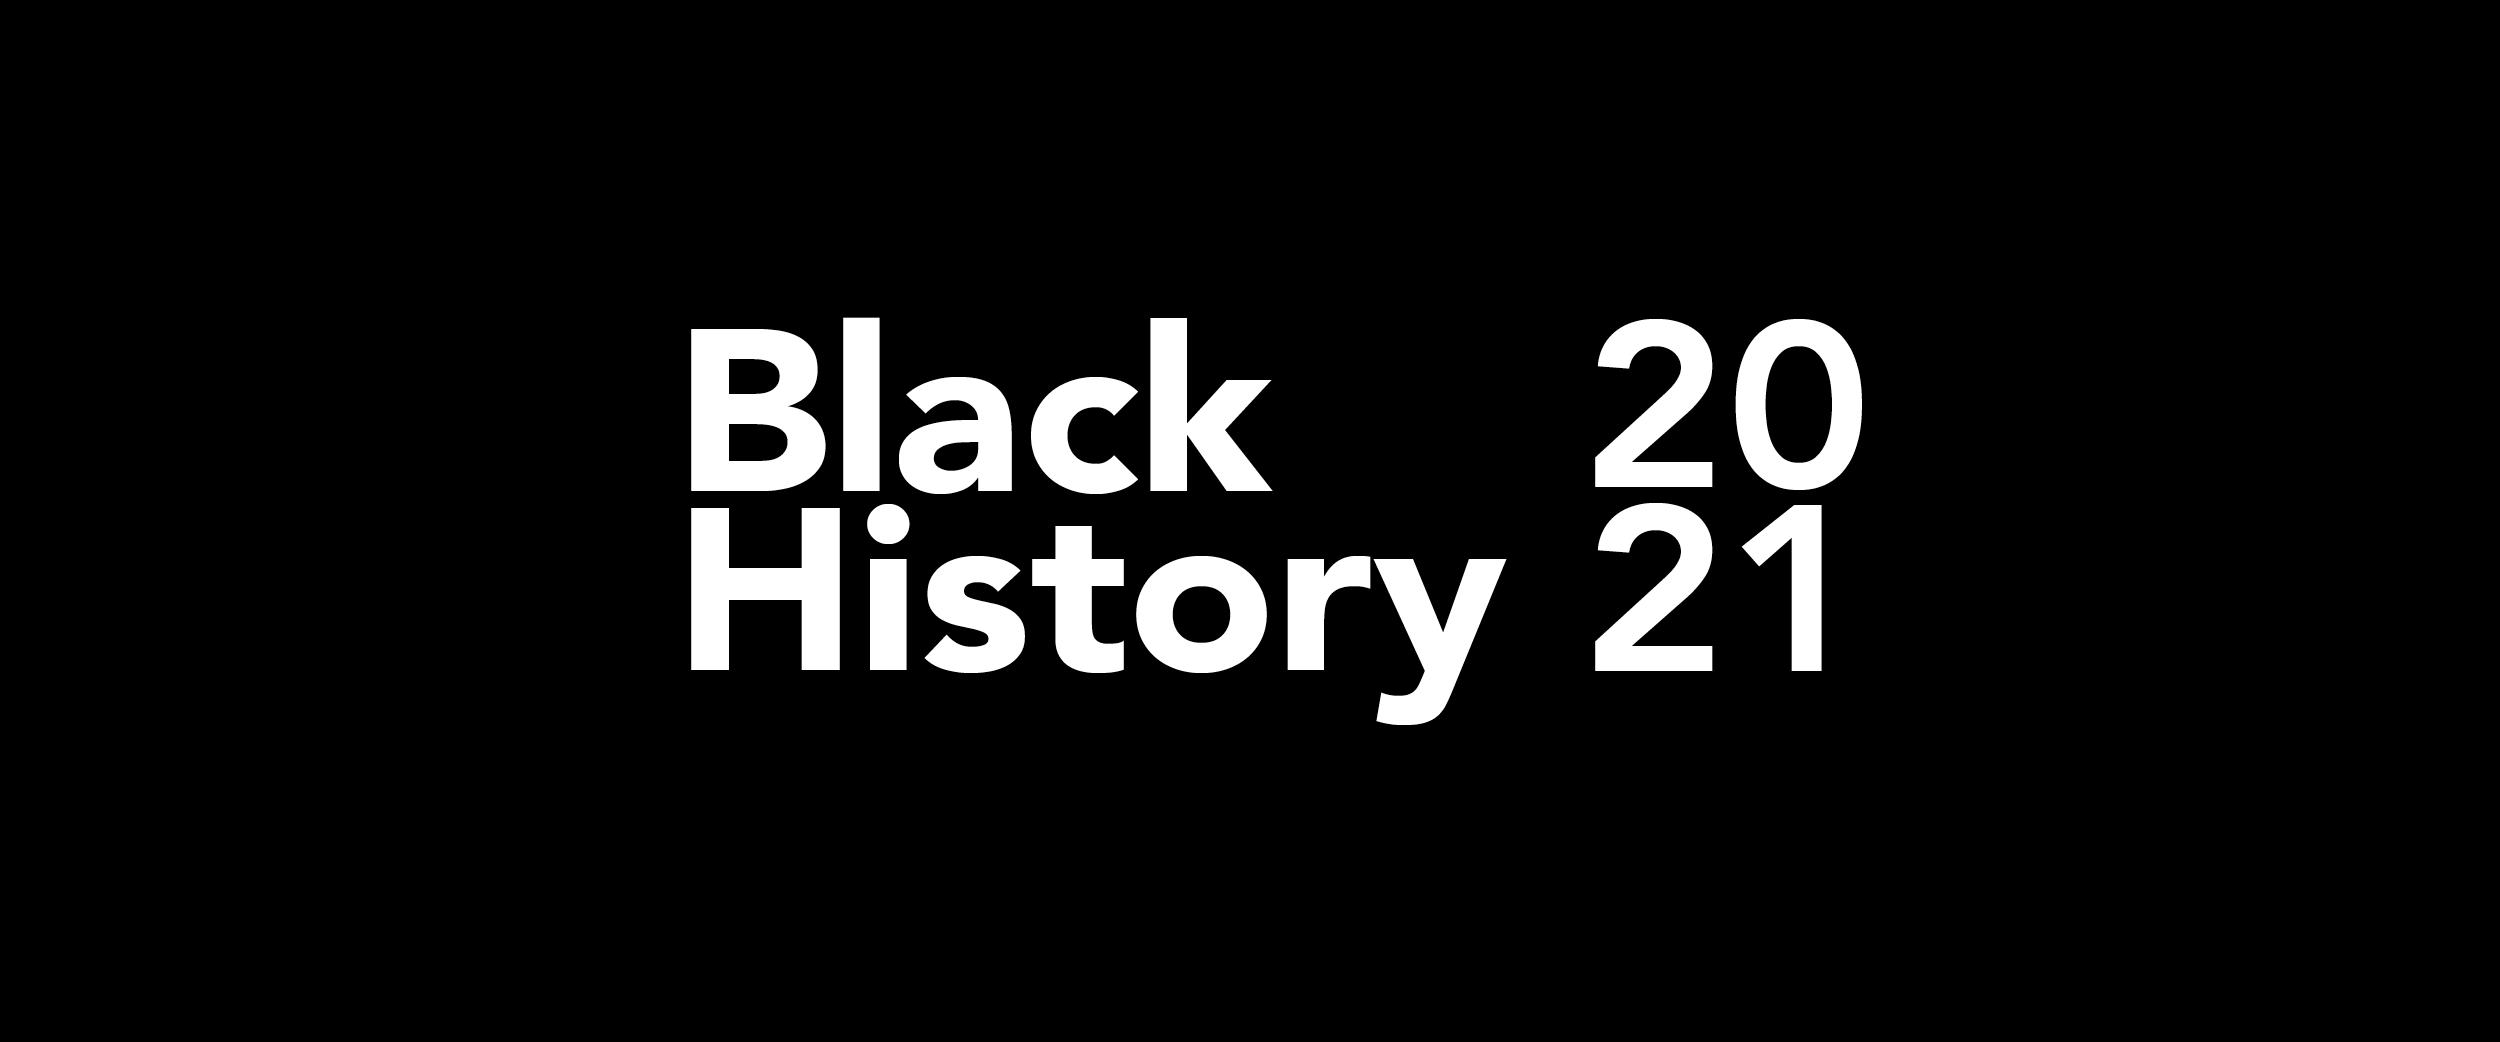 2021-10-01 Black History Website banner